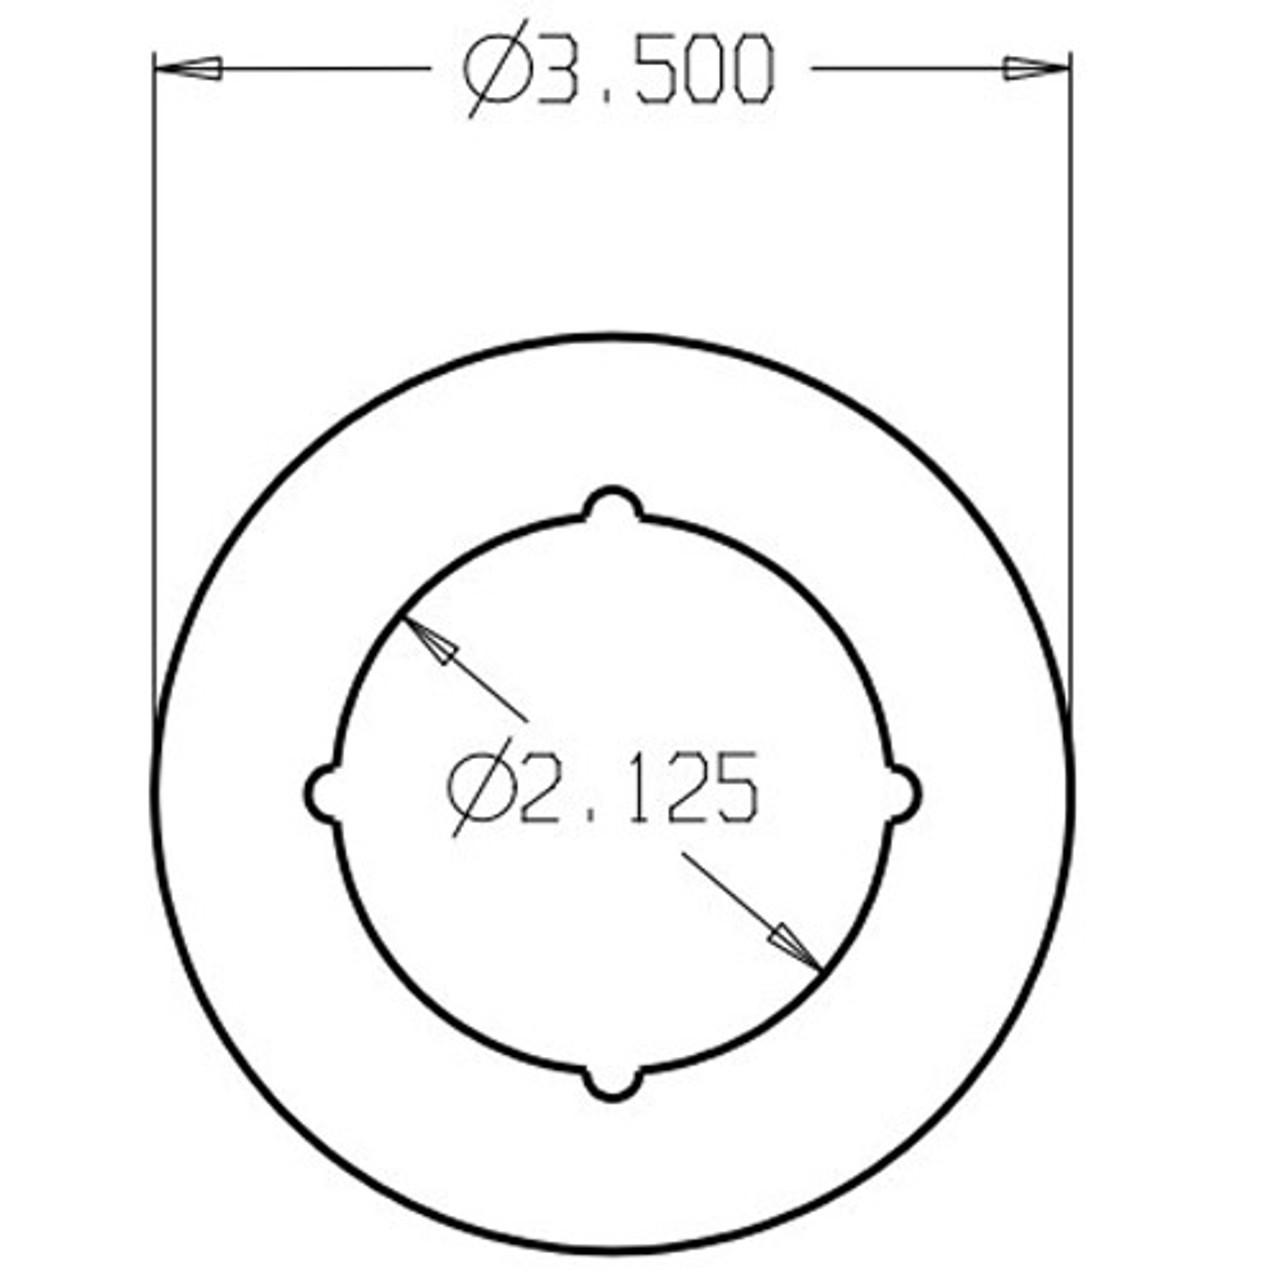 PBSP-135-605 Don Jo Scar Plate Dimensional View